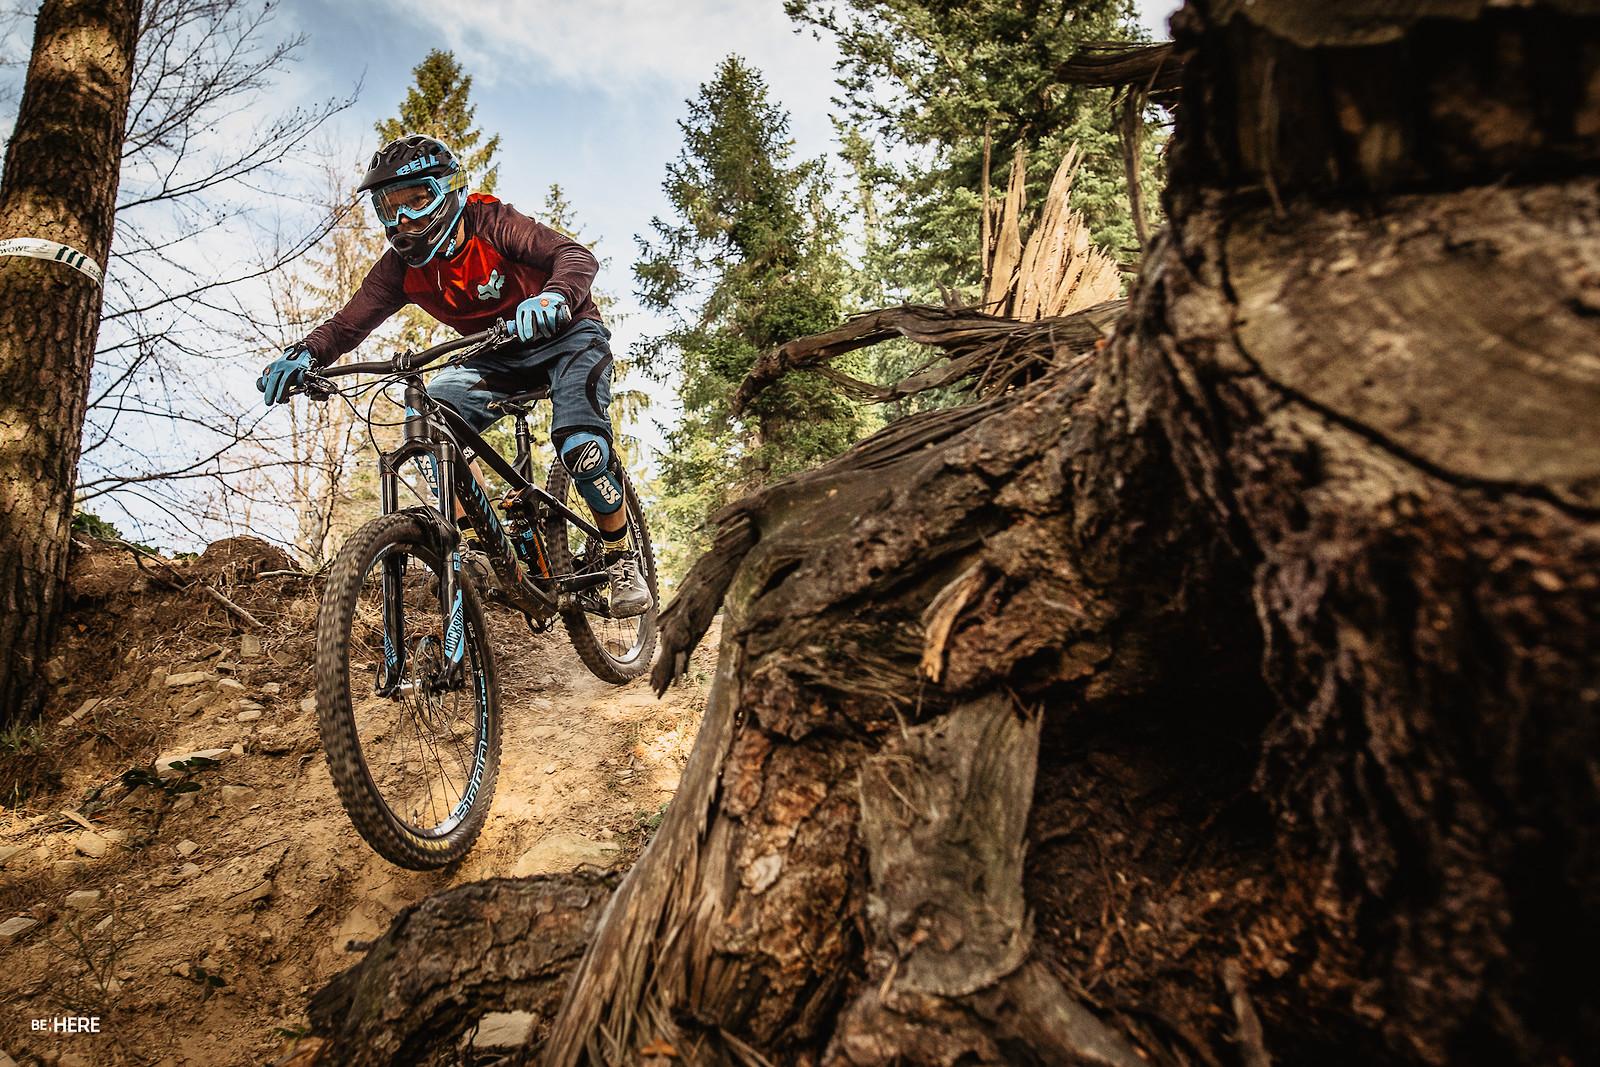 IMG 1216 - eseli - Mountain Biking Pictures - Vital MTB